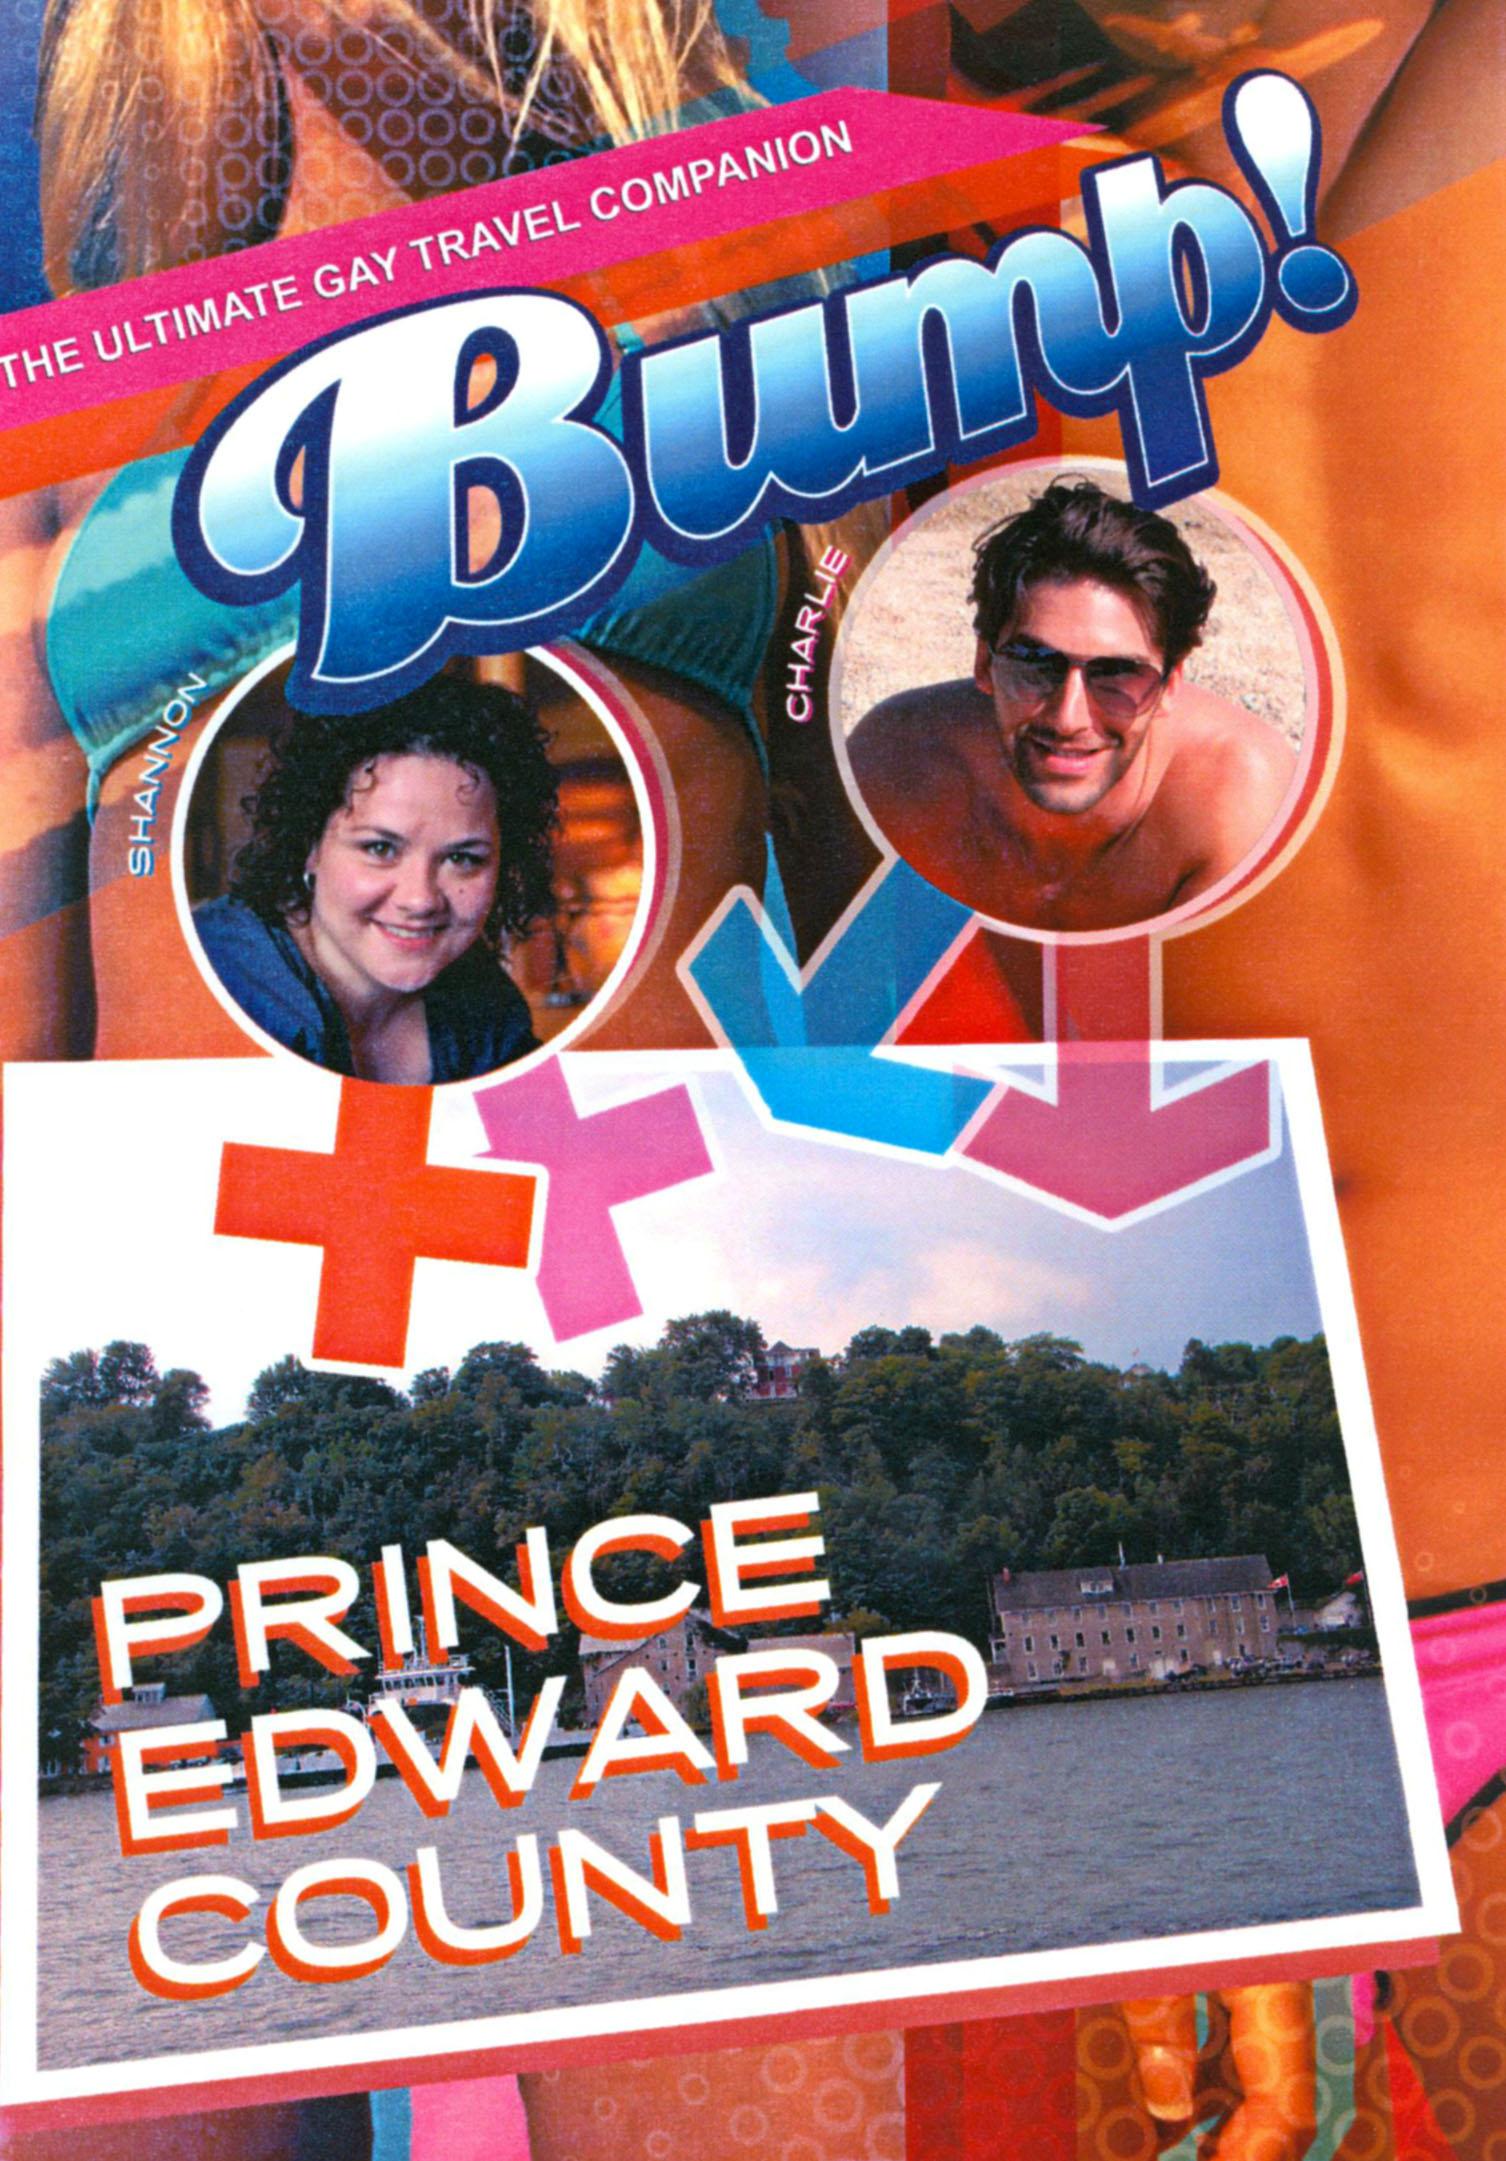 Bump!: Prince Edward County